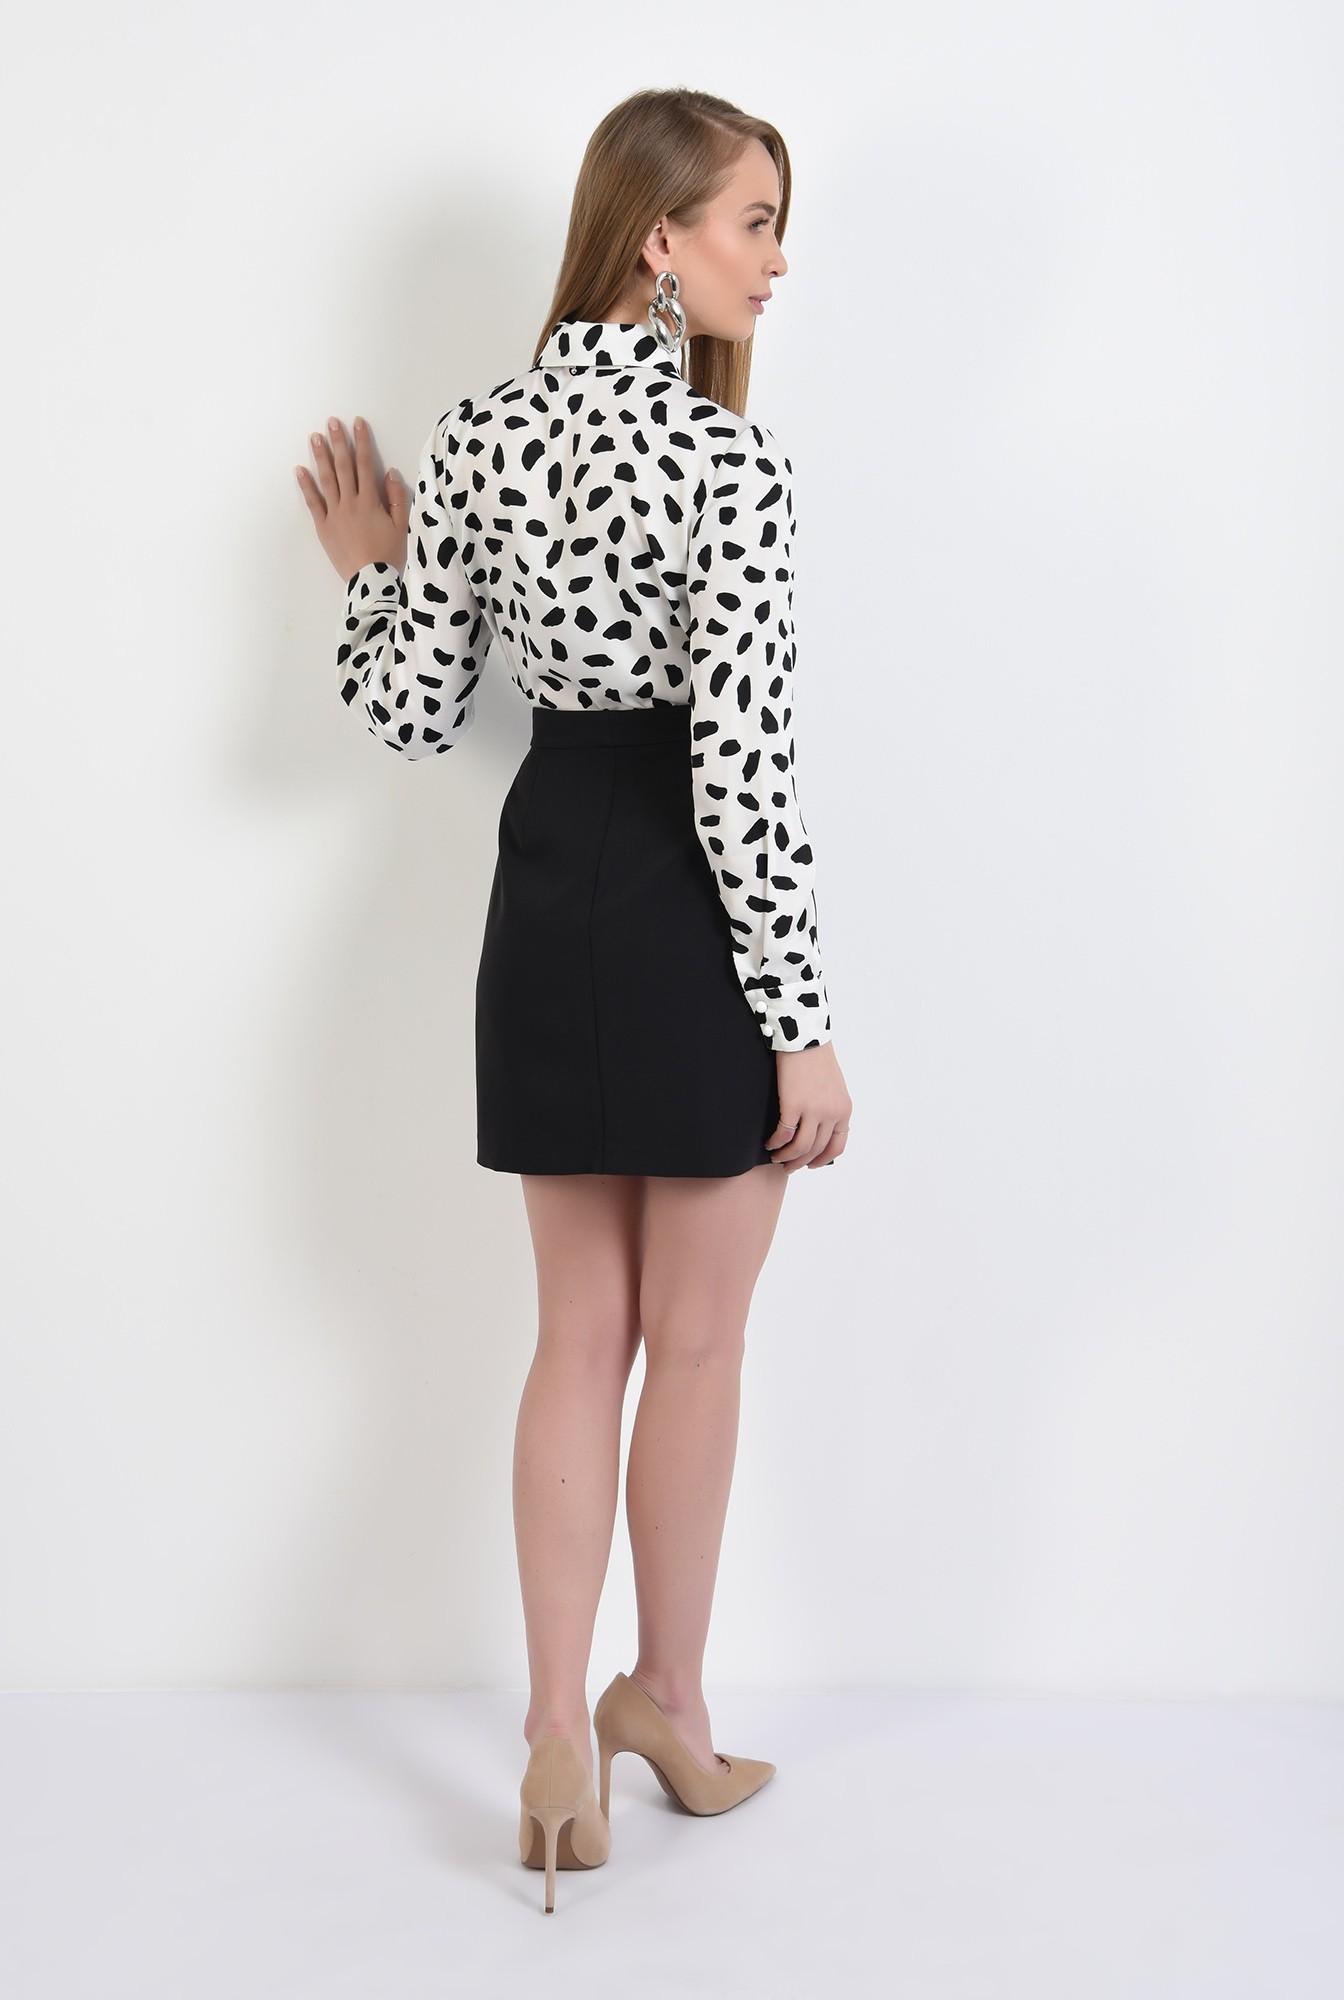 1 -  camasa cu imprimeu, din satin, alb-negru, camasa de primavara